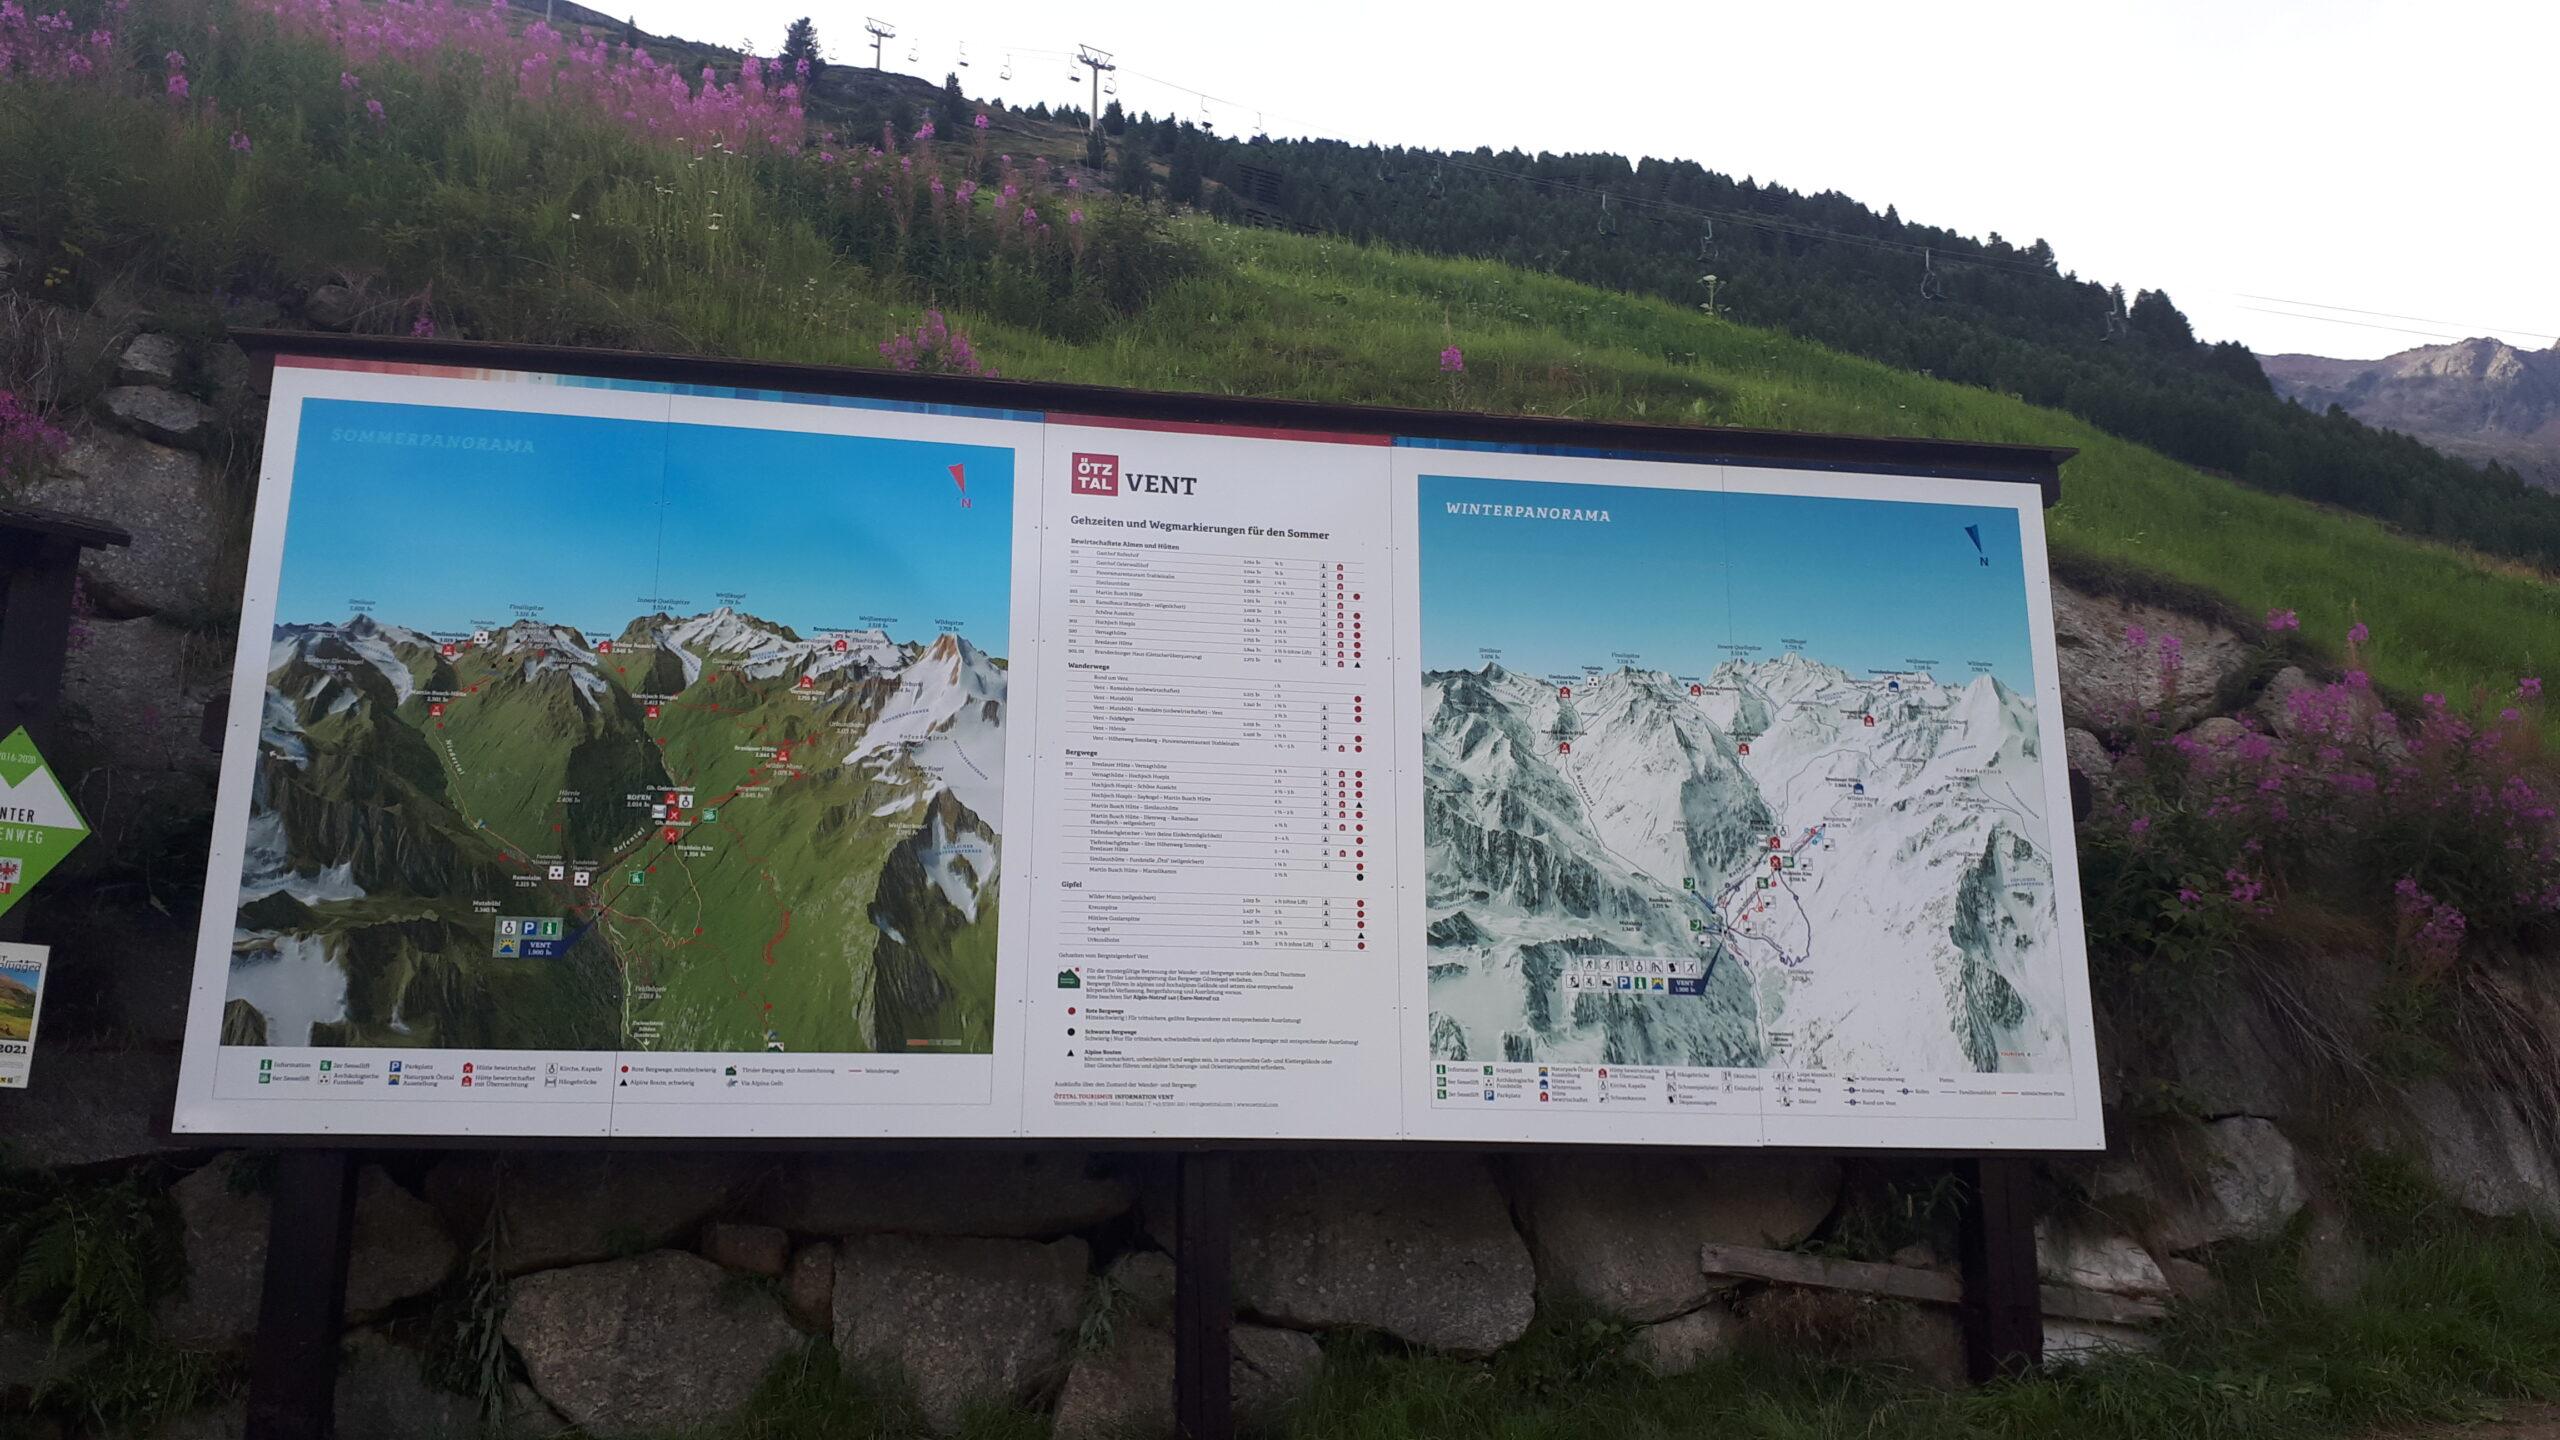 3D Panoramakarte - Panoramatafel Vent Ötztal Sommer- und Winterpanorama